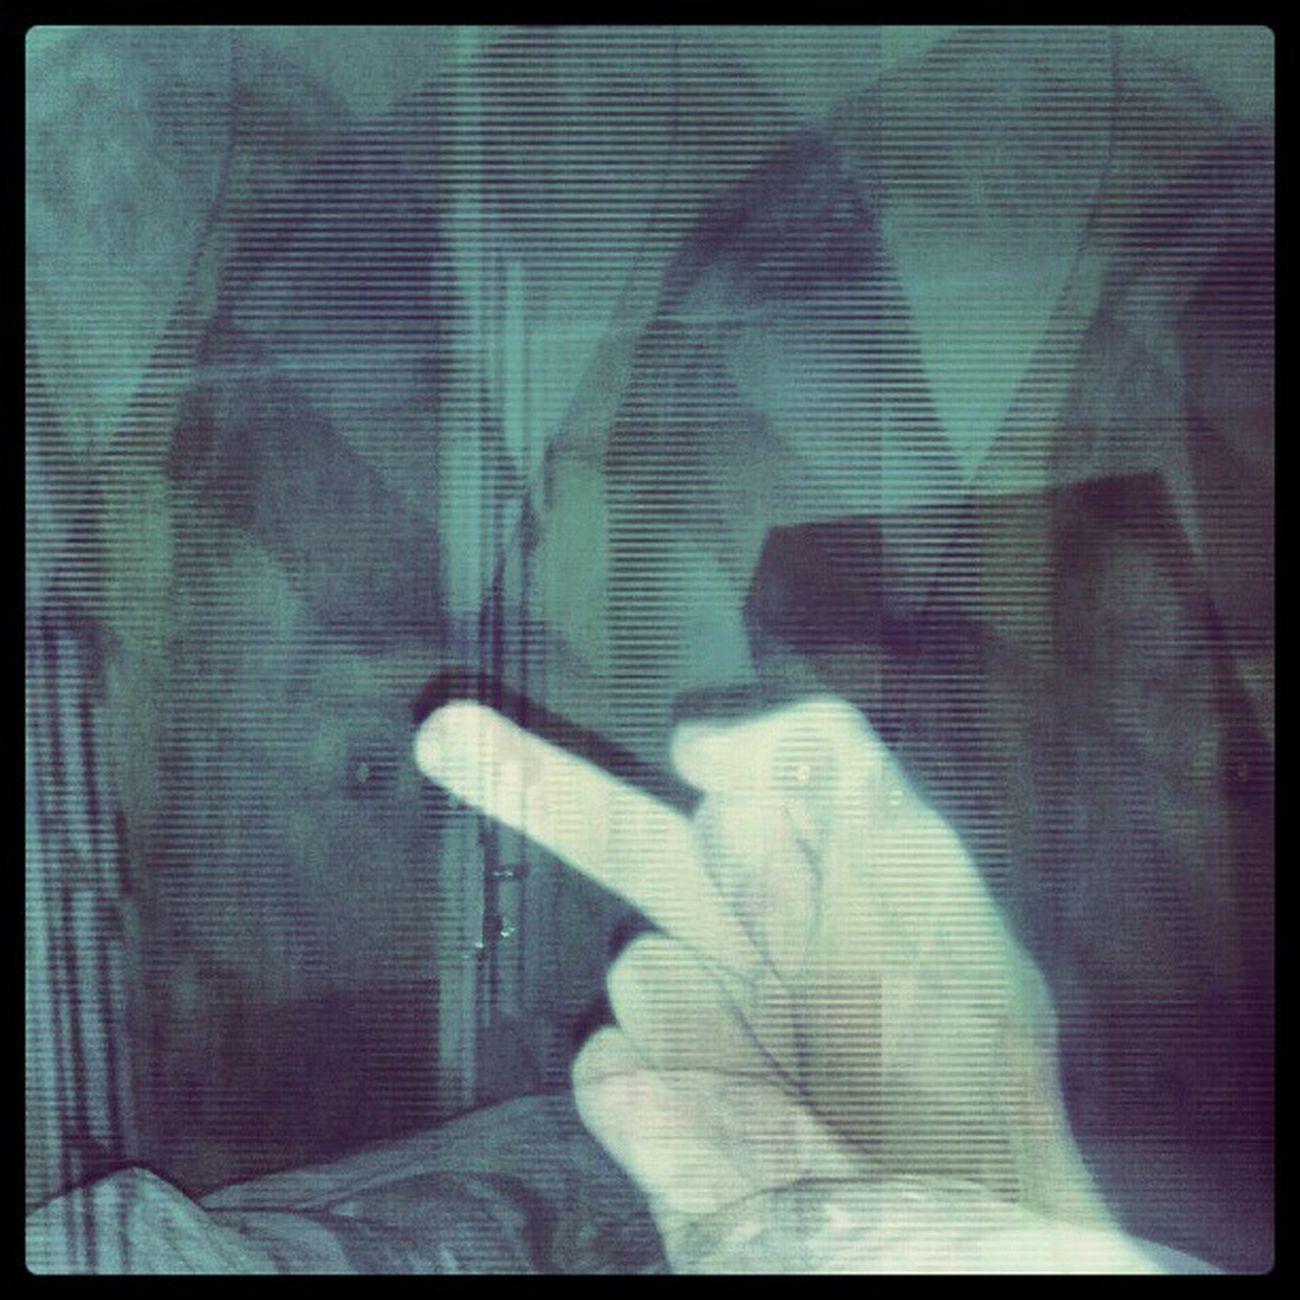 призрак мудила фак Fuck man cat hipstagram instagram picture art go fin rip dead lol